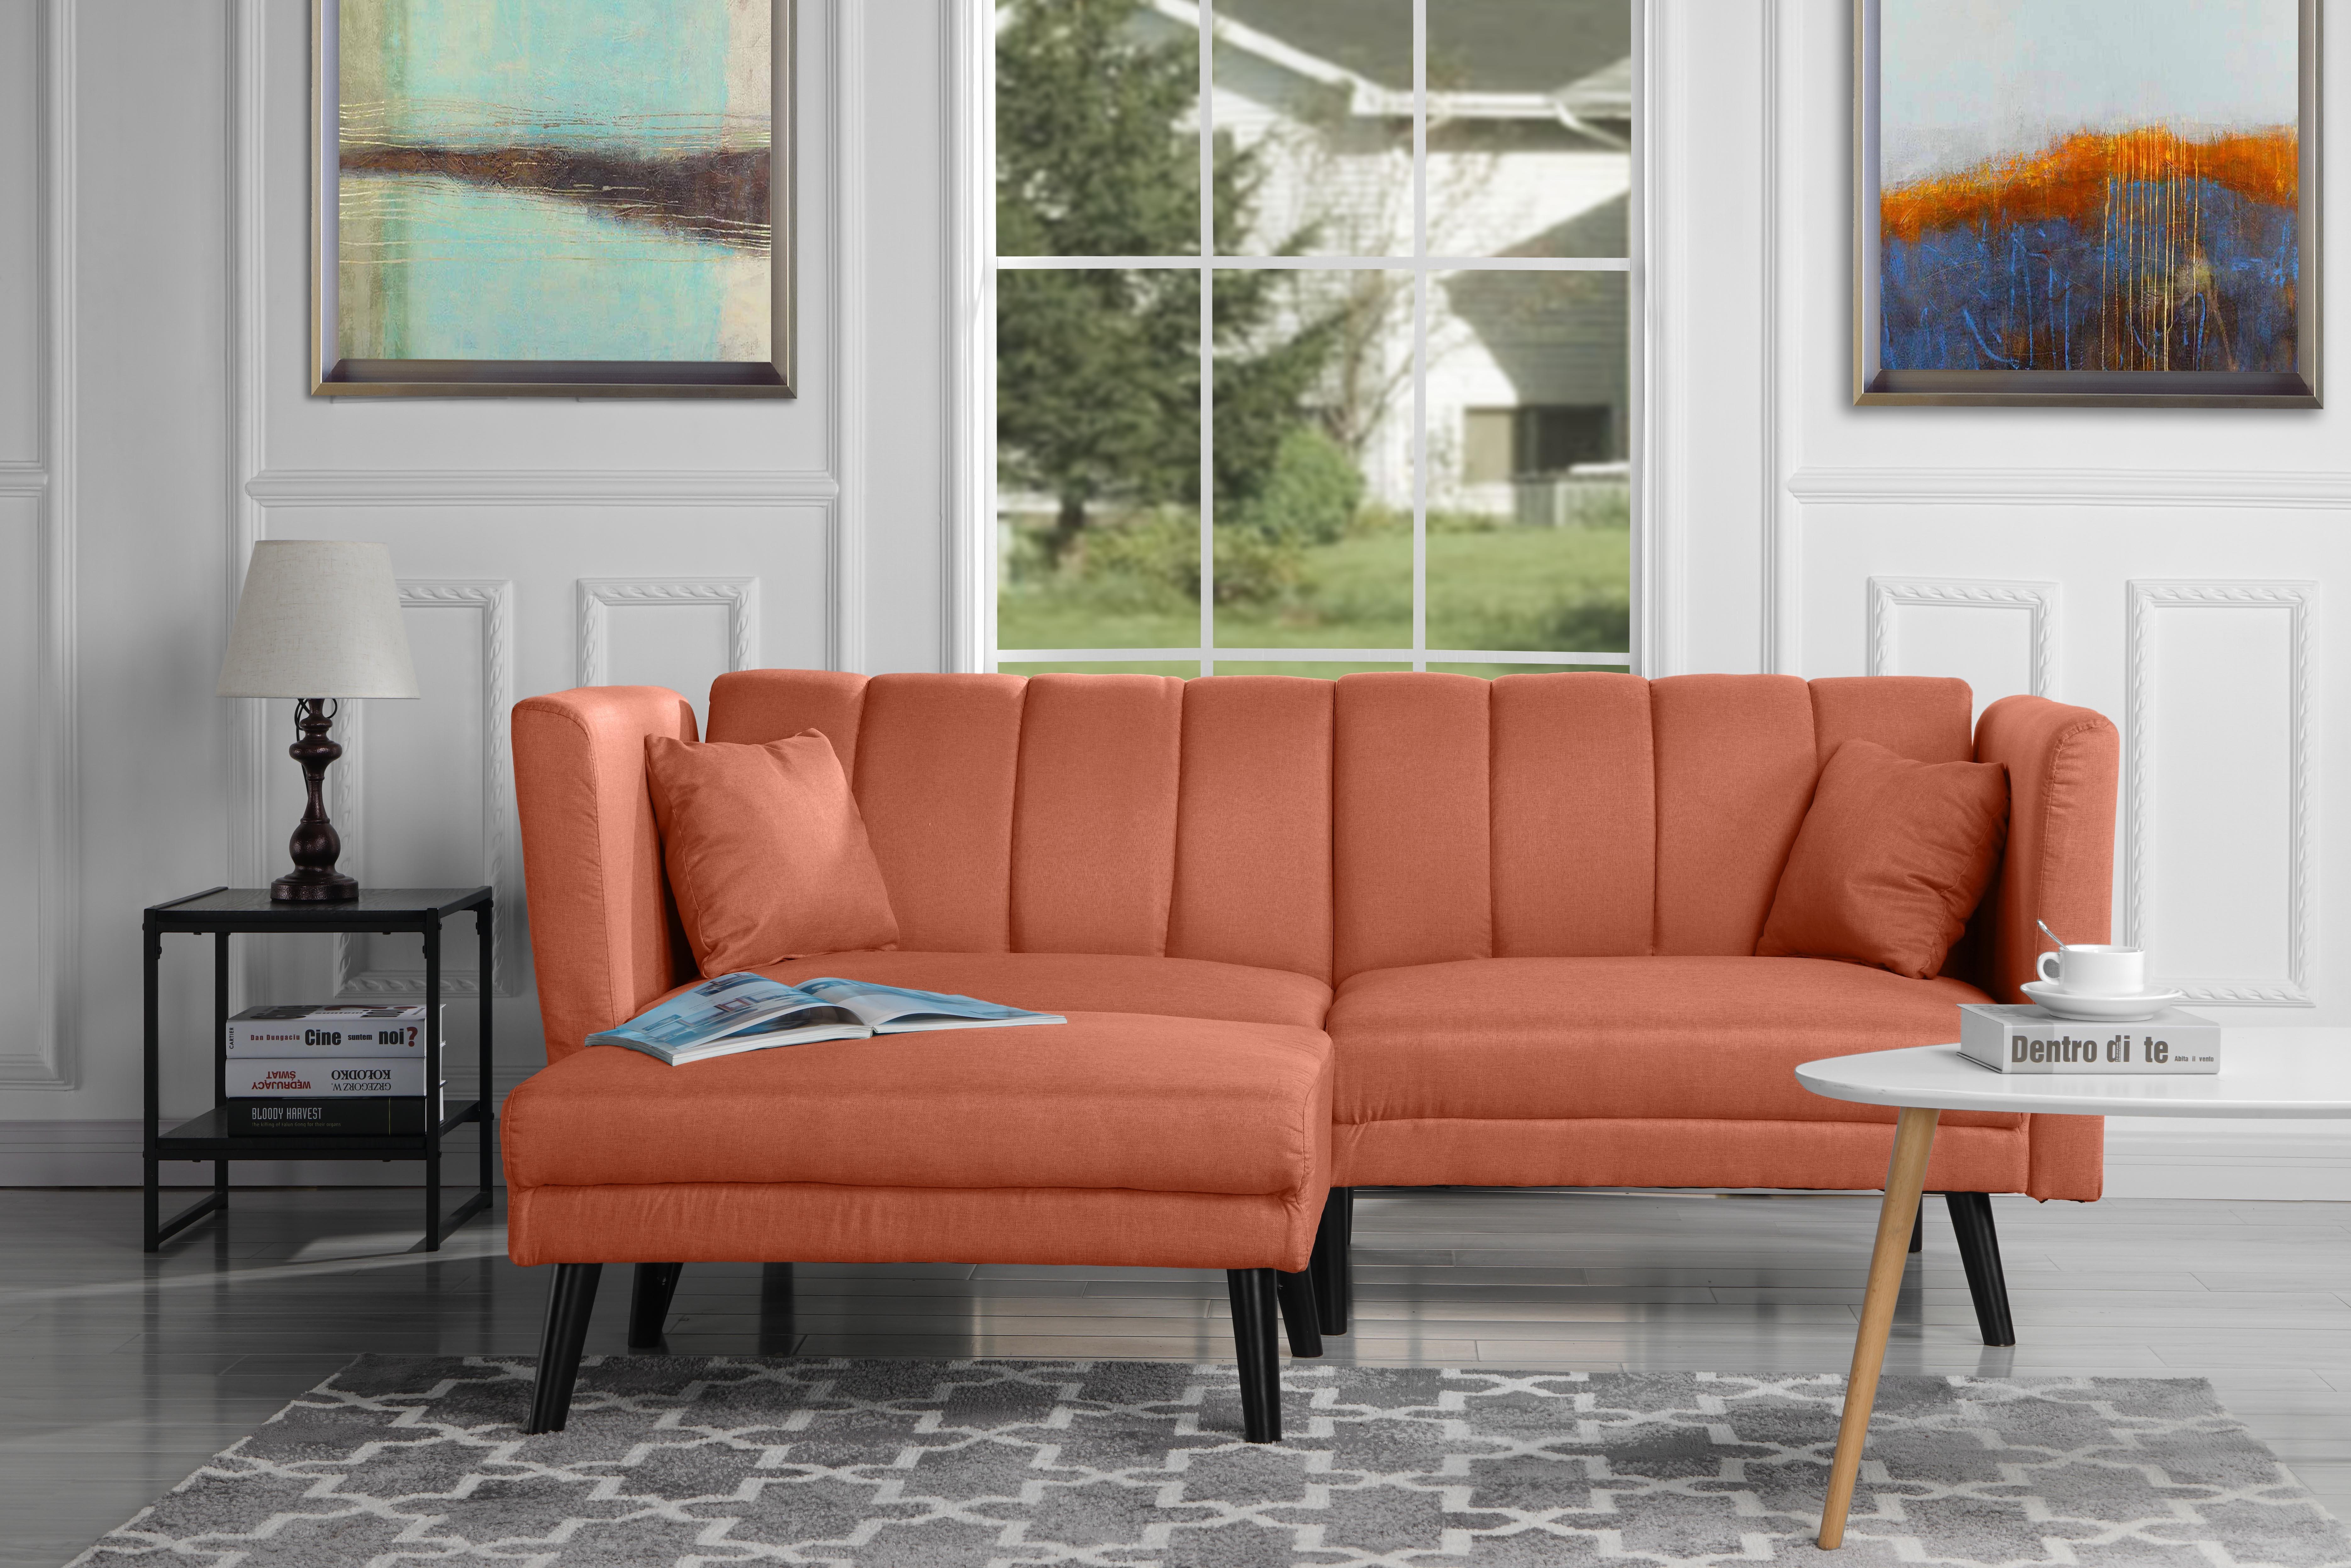 Mid Century Modern Fabric Futon Sofa Bed, Sleeper, Orange ...